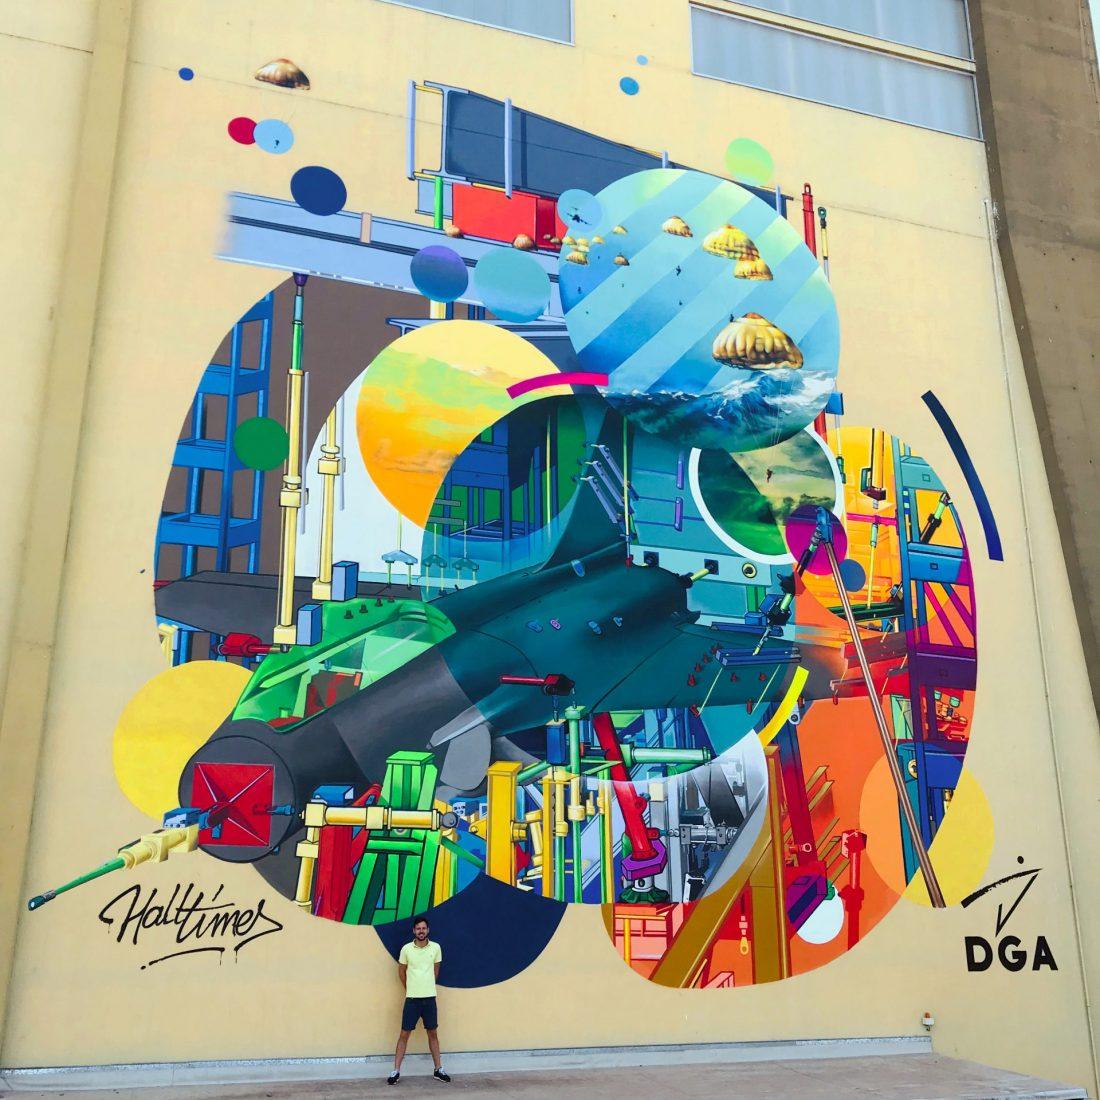 graff graffeur toulouse halltimes julien avignon fresque dga ceat balma artiste